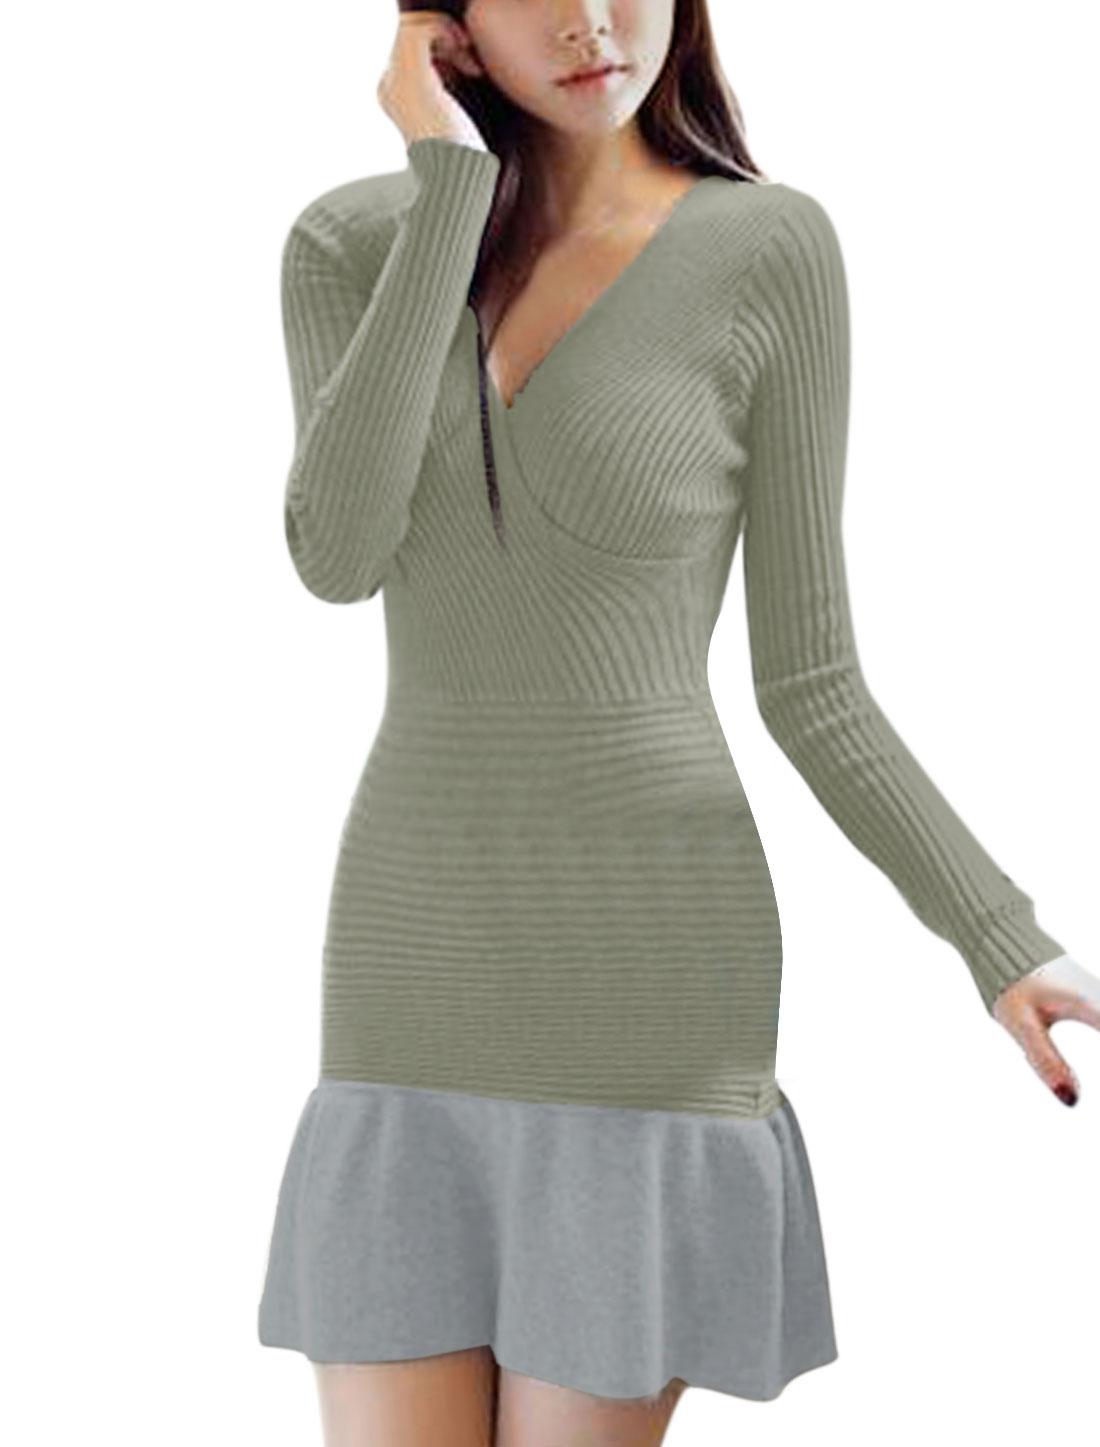 Lady Cross V Neck Pullover Slim Knitted Dress Light Gray M